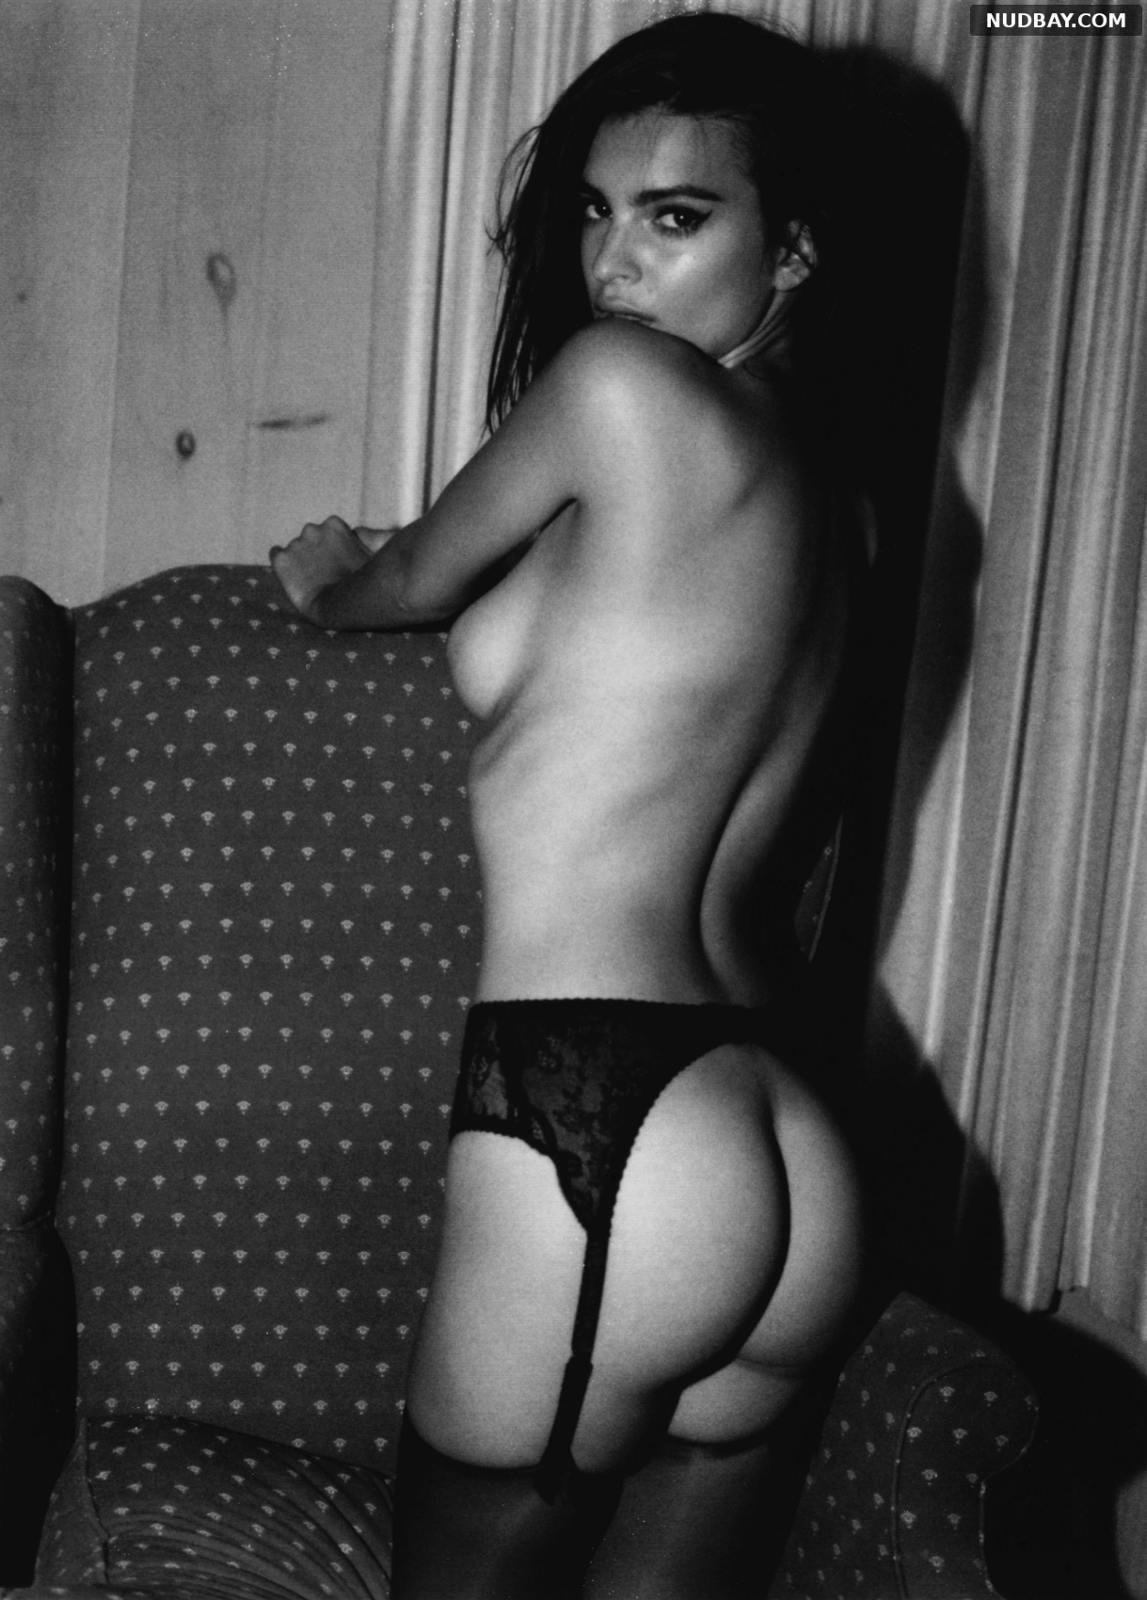 Emily Ratajkowski Too Sexy Showing Bare Butt 2021